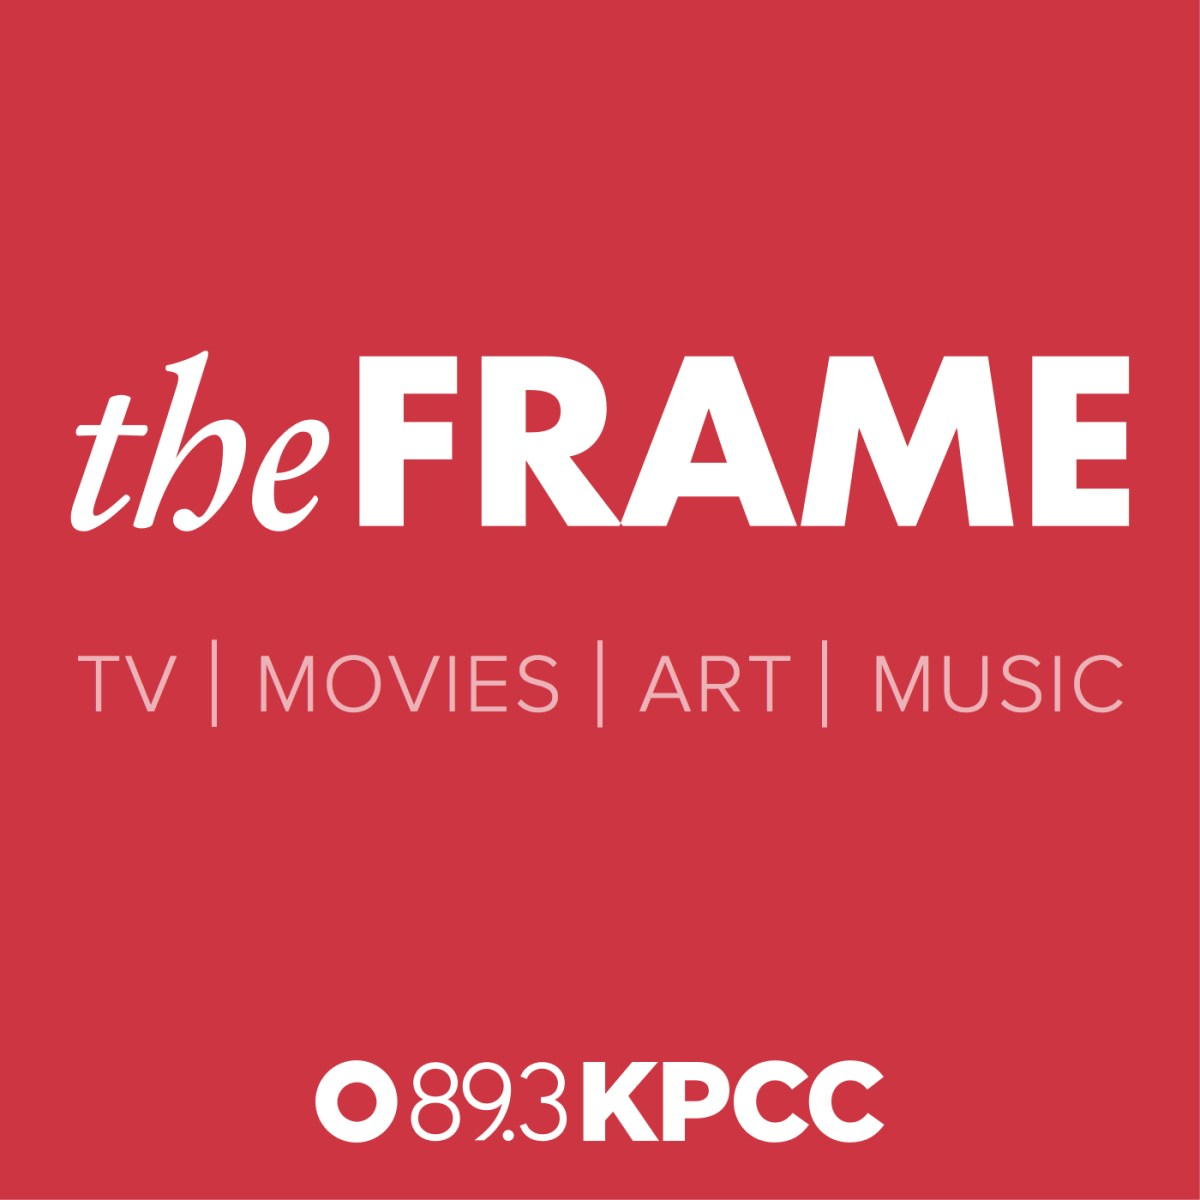 The Frame (KPCC)